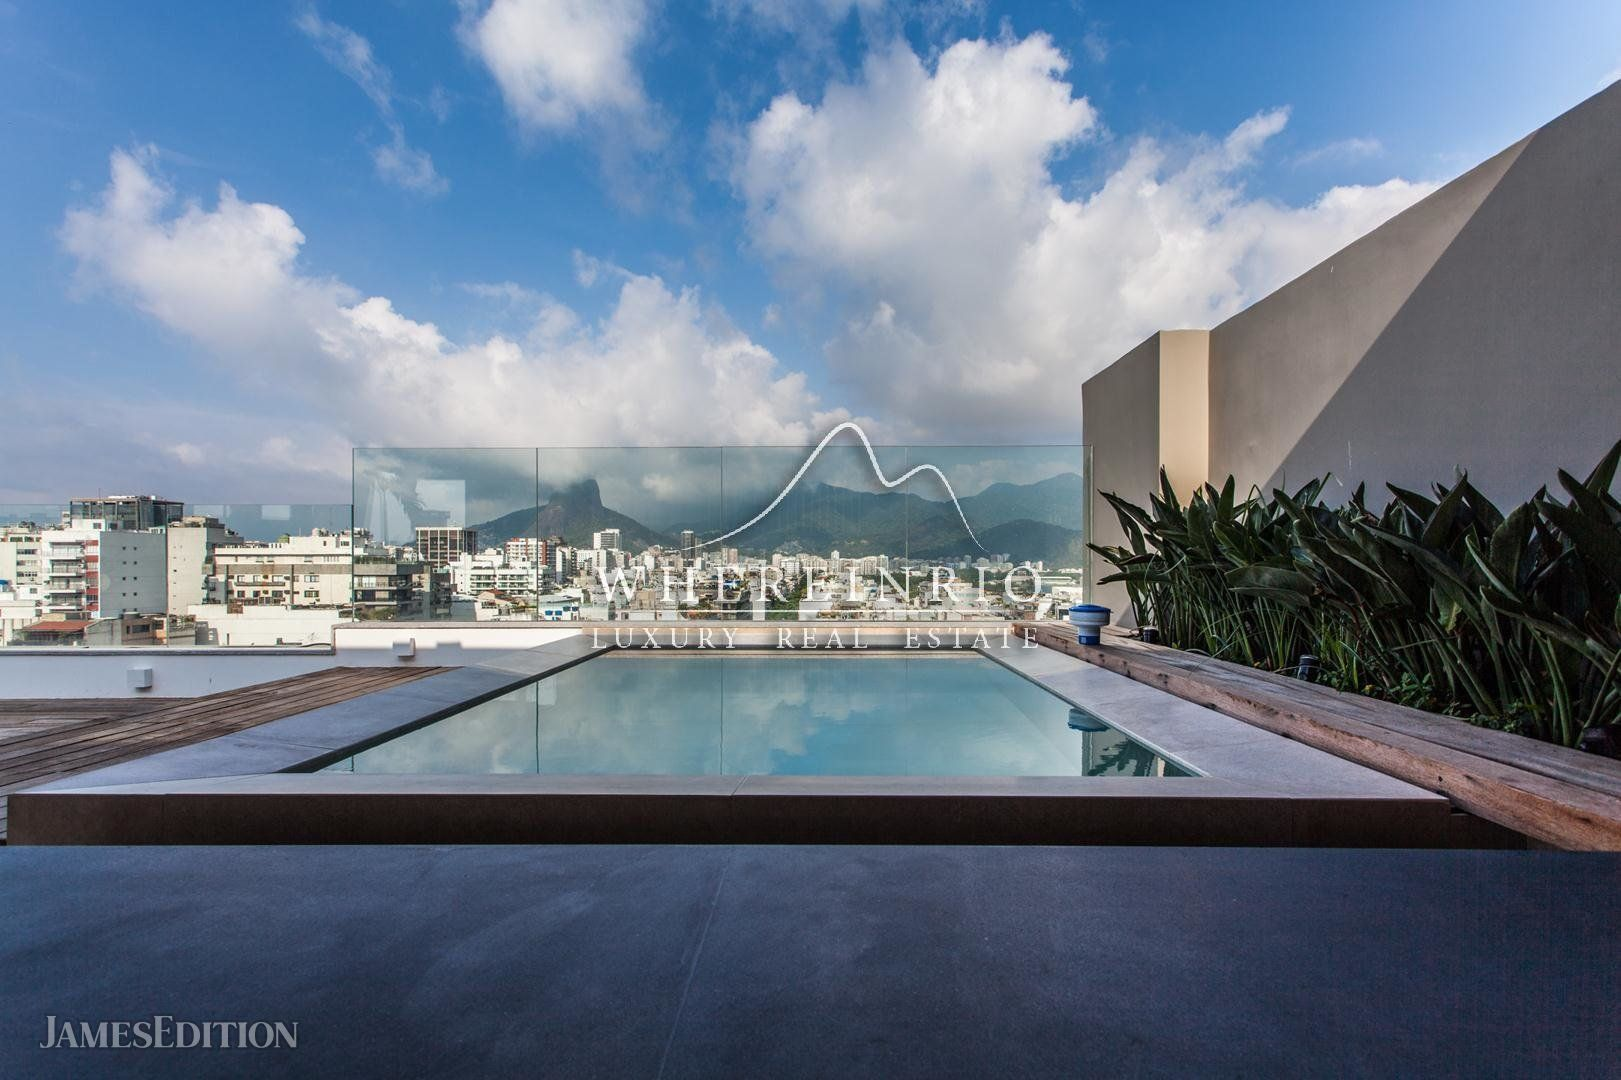 Apartment in Rio de Janeiro, State of Rio de Janeiro, Brazil 1 - 10689899